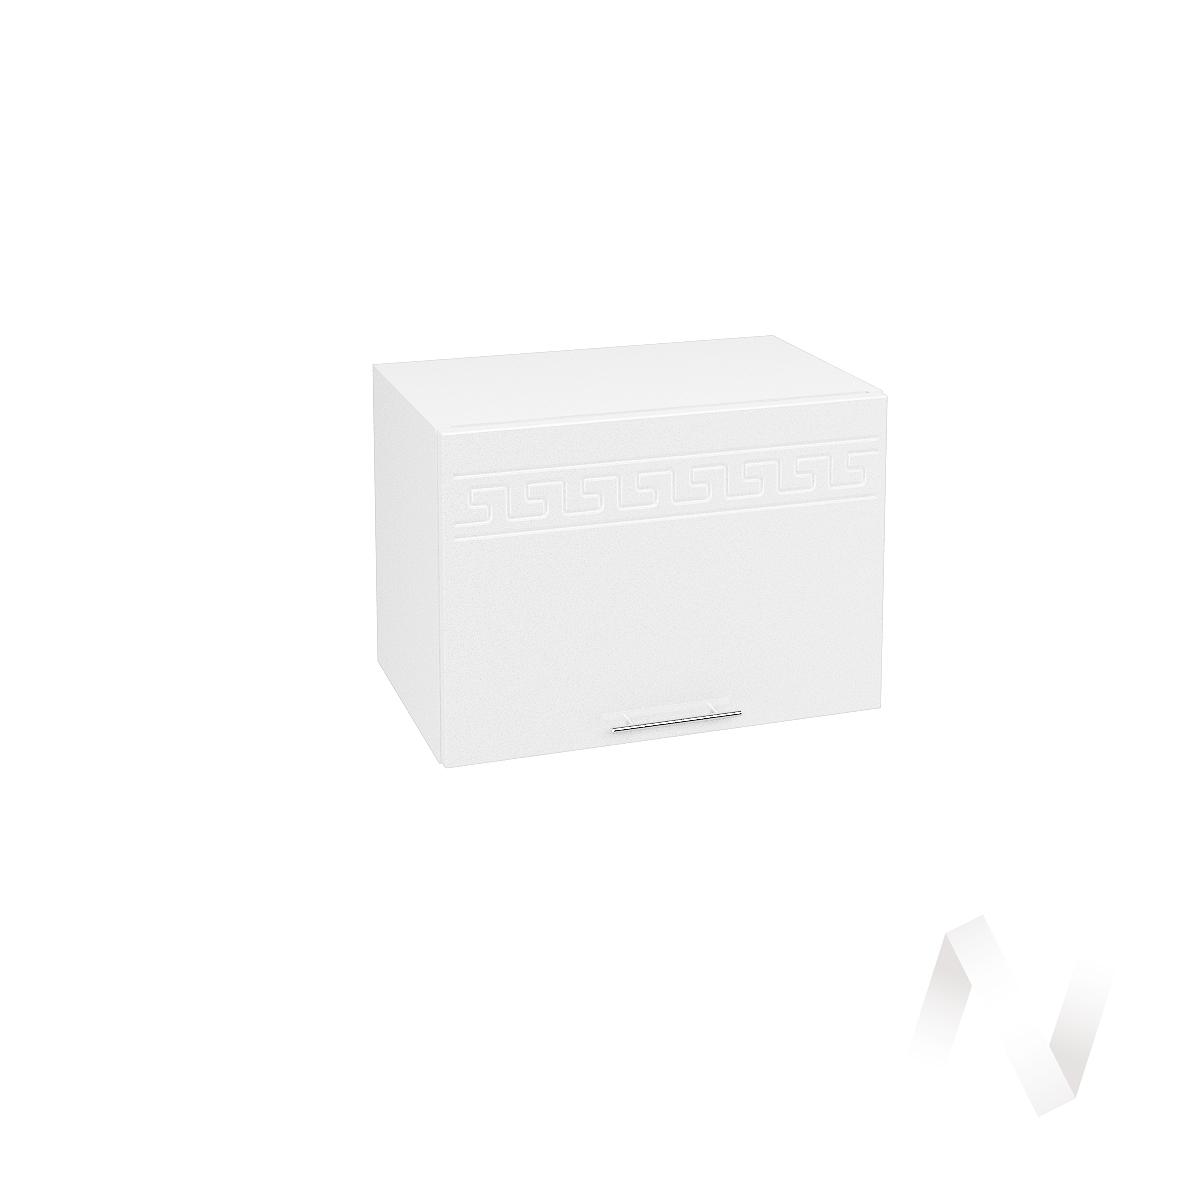 "Кухня ""Греция"": Шкаф верхний горизонтальный 500, ШВГ 500 (белый металлик/корпус белый)"